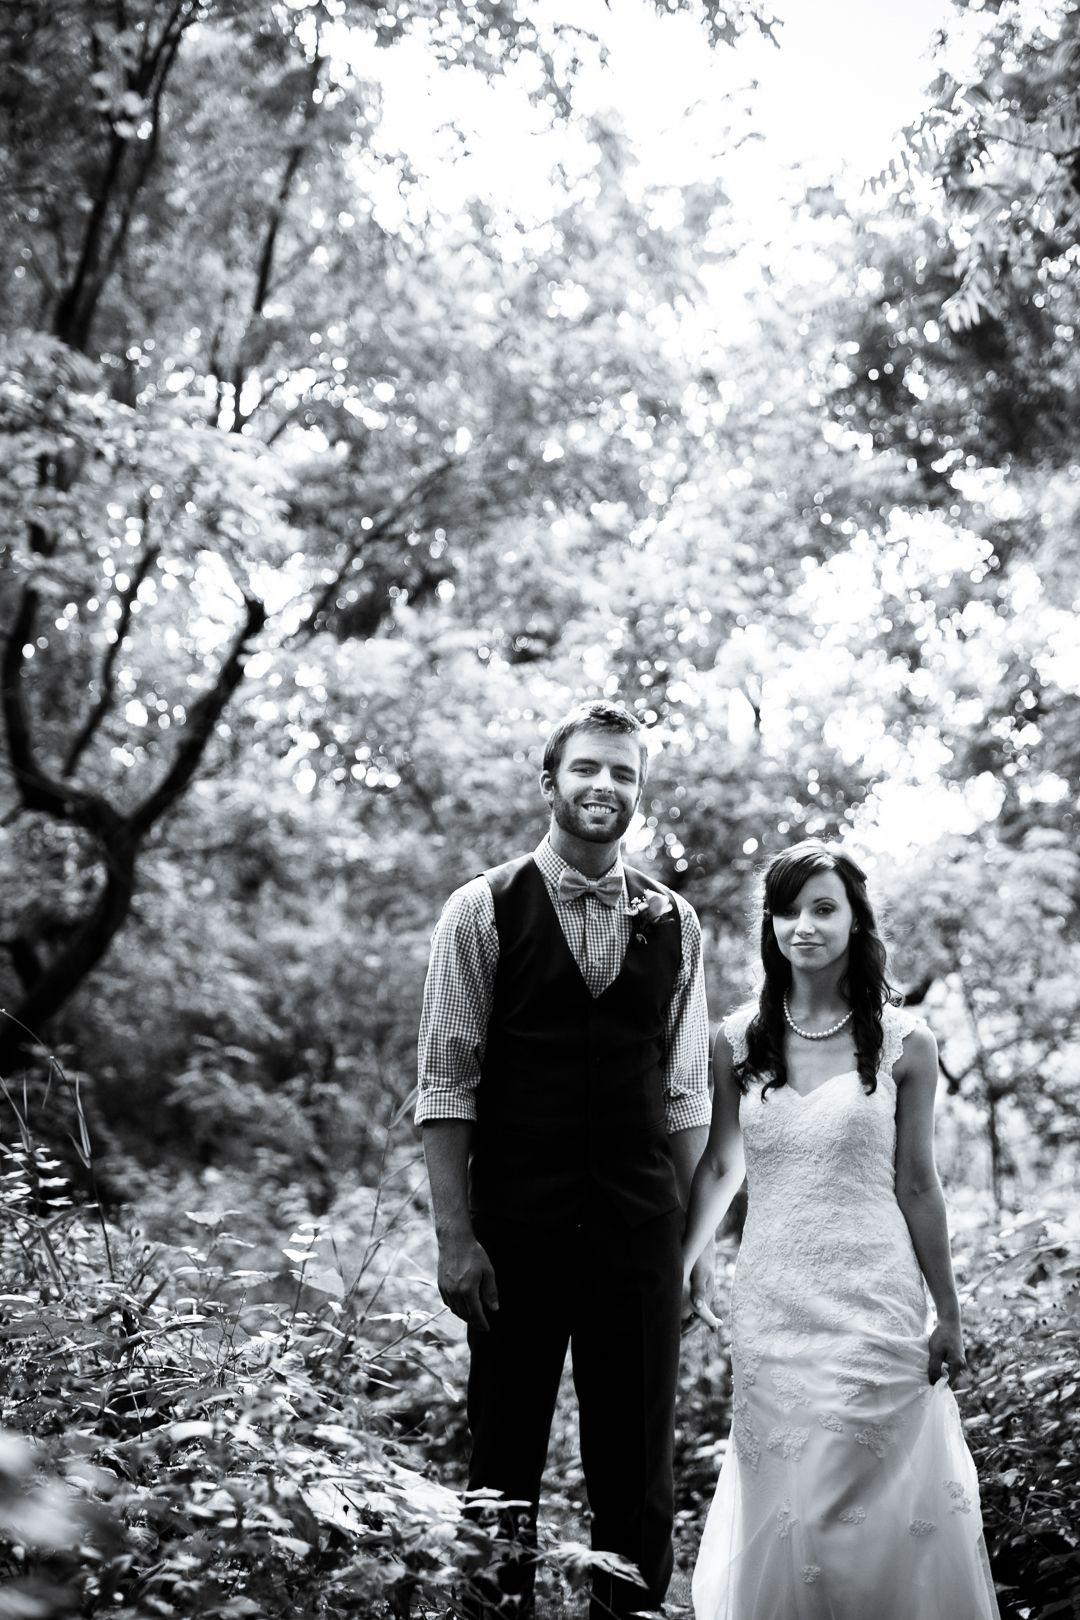 Simit Oliver Photography #bride #groom #wedding